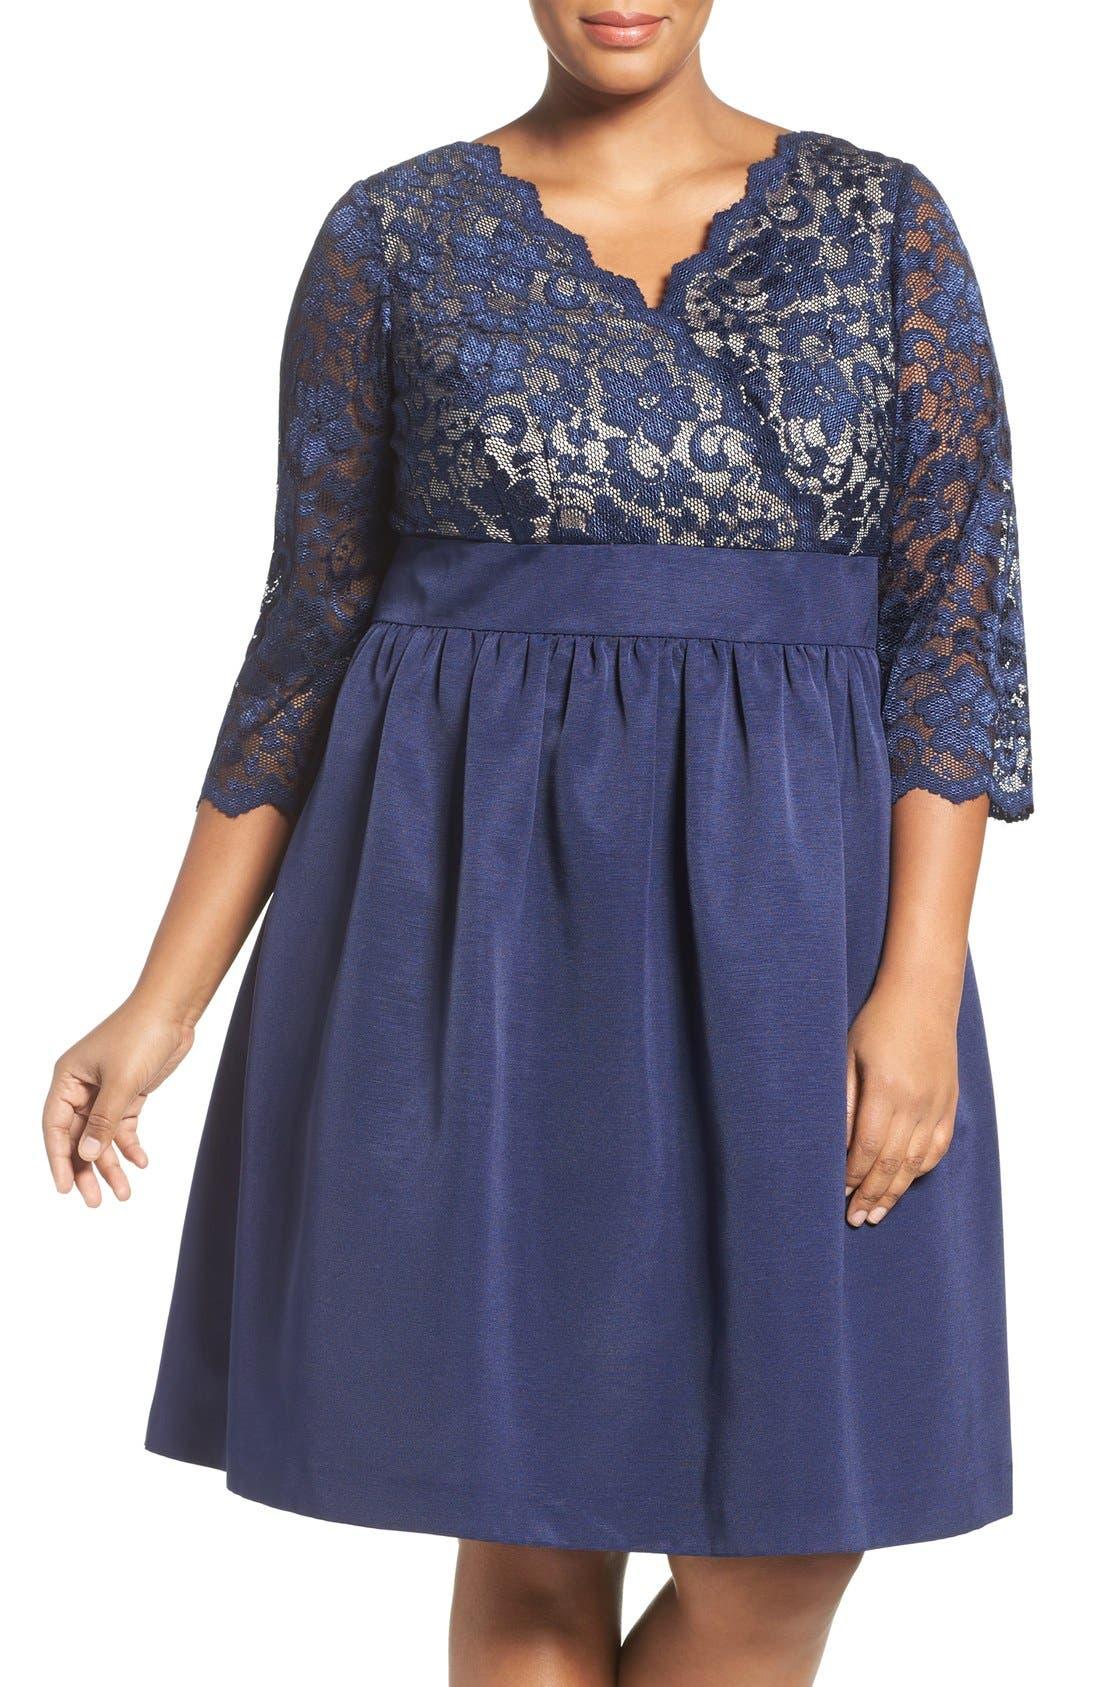 Alternate Image 1 Selected - Eliza J Lace & Faille Dress (Plus Size)